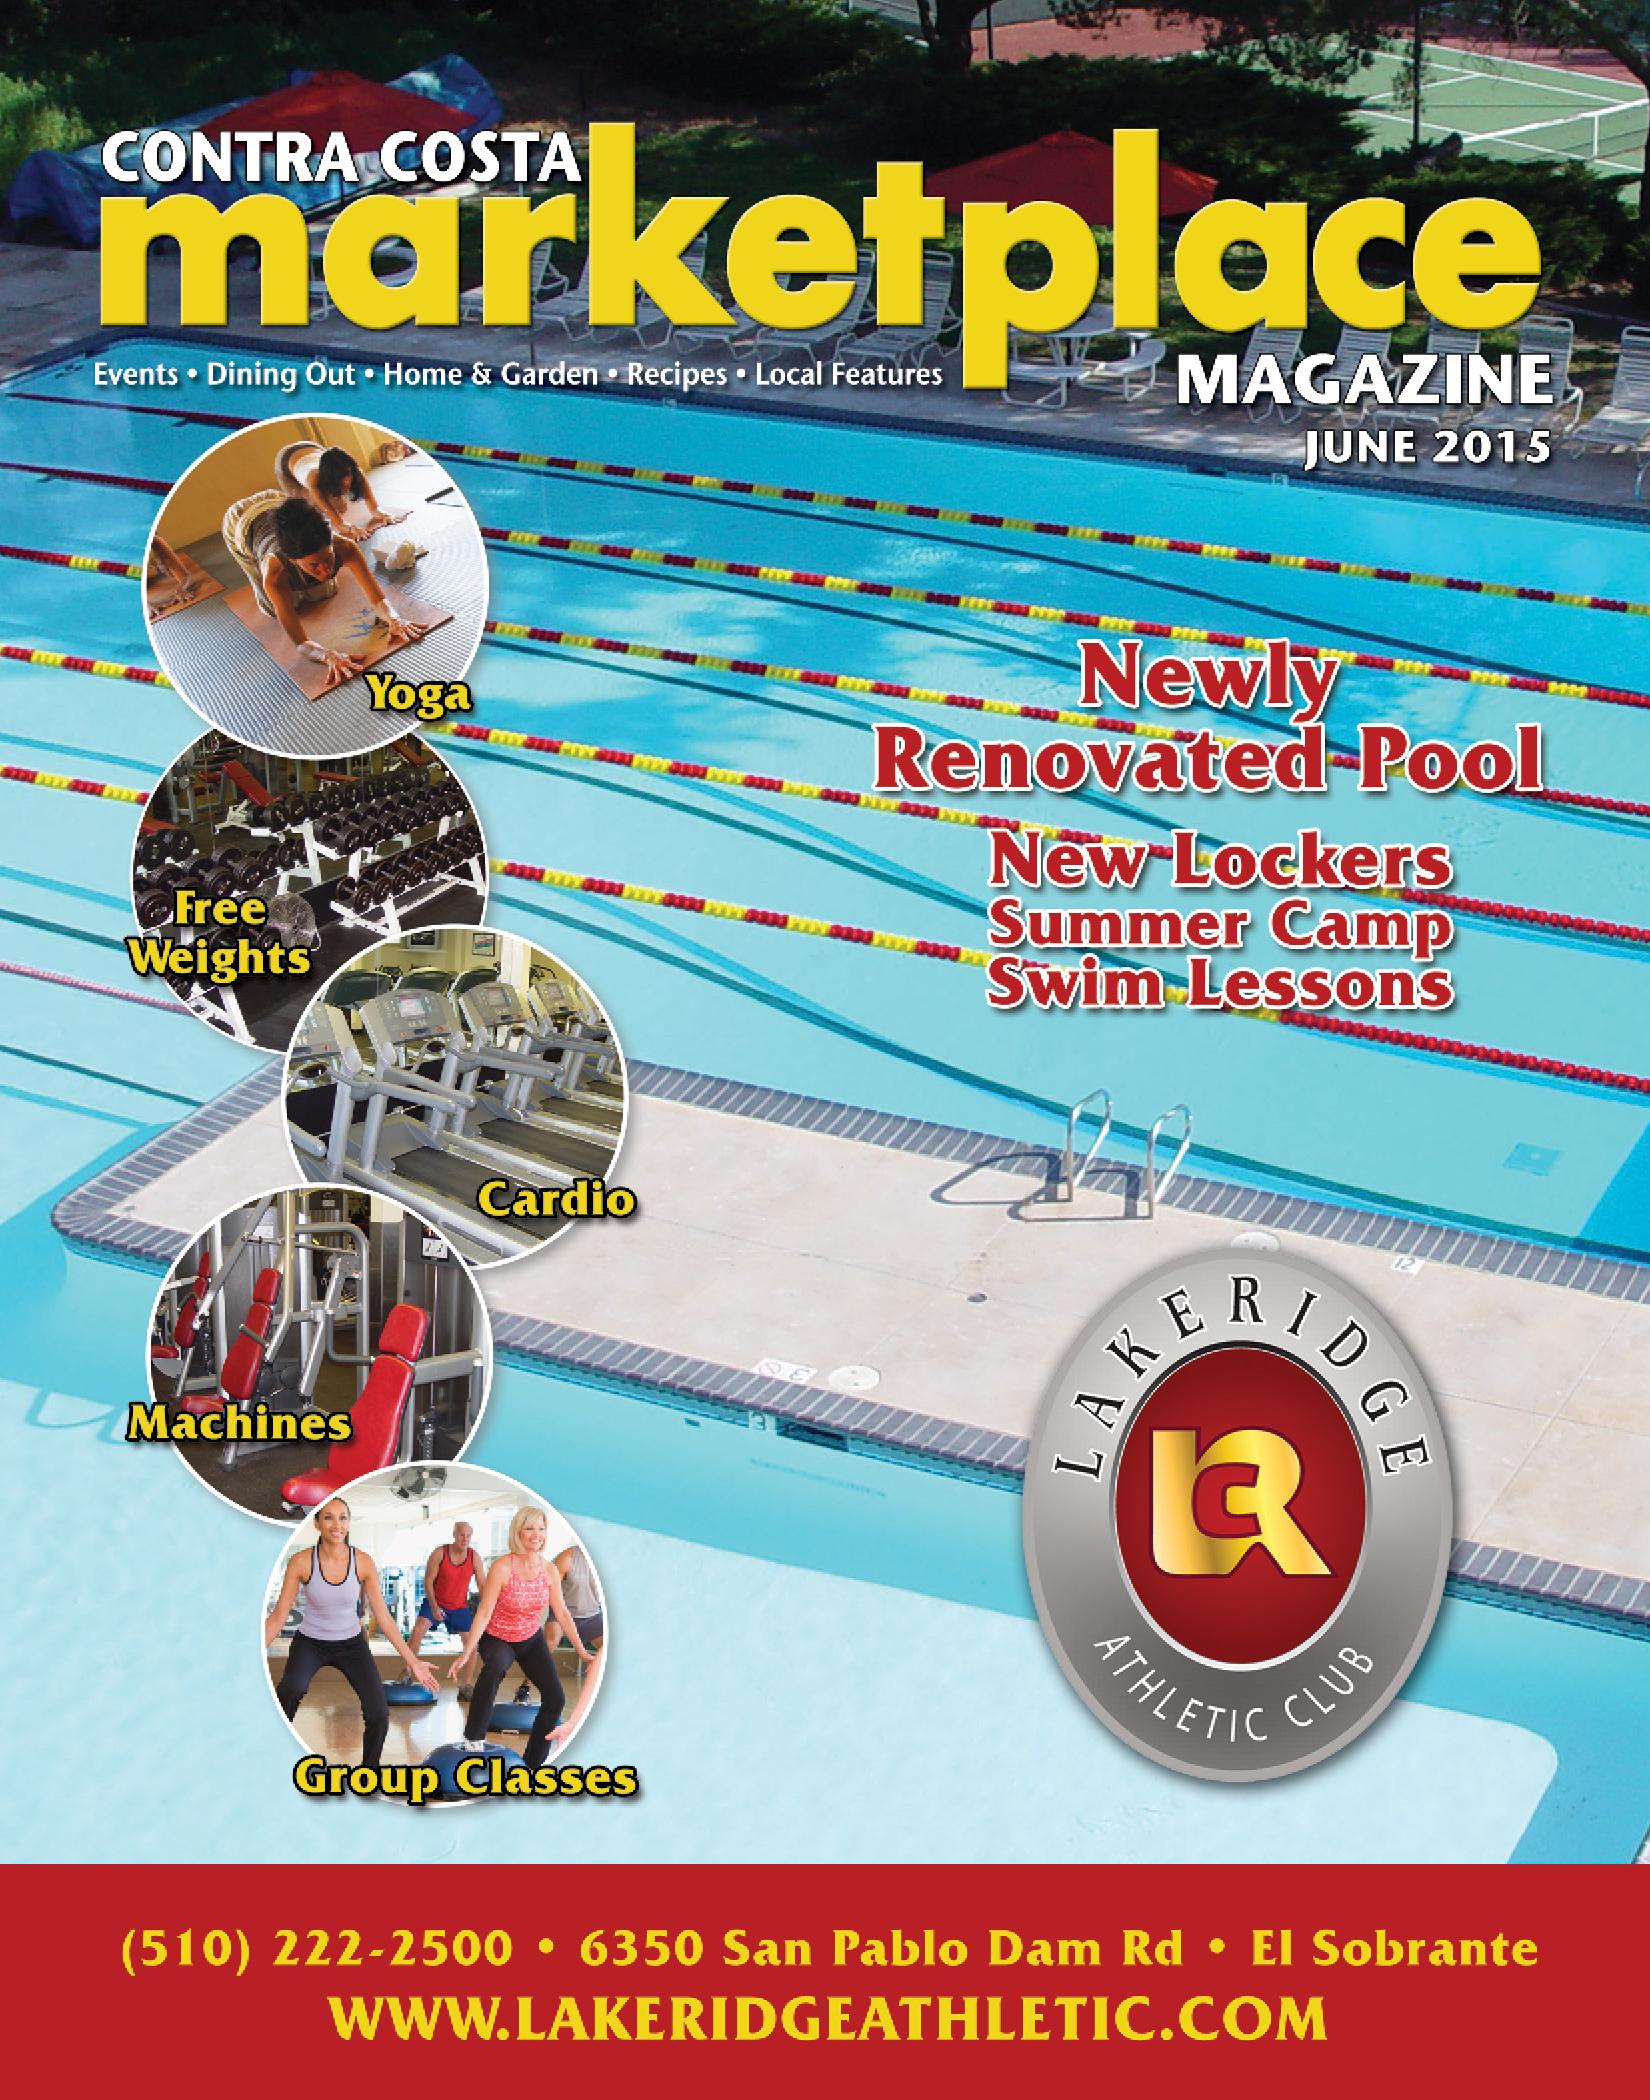 Lakeridge Cover 0615HR.jpg